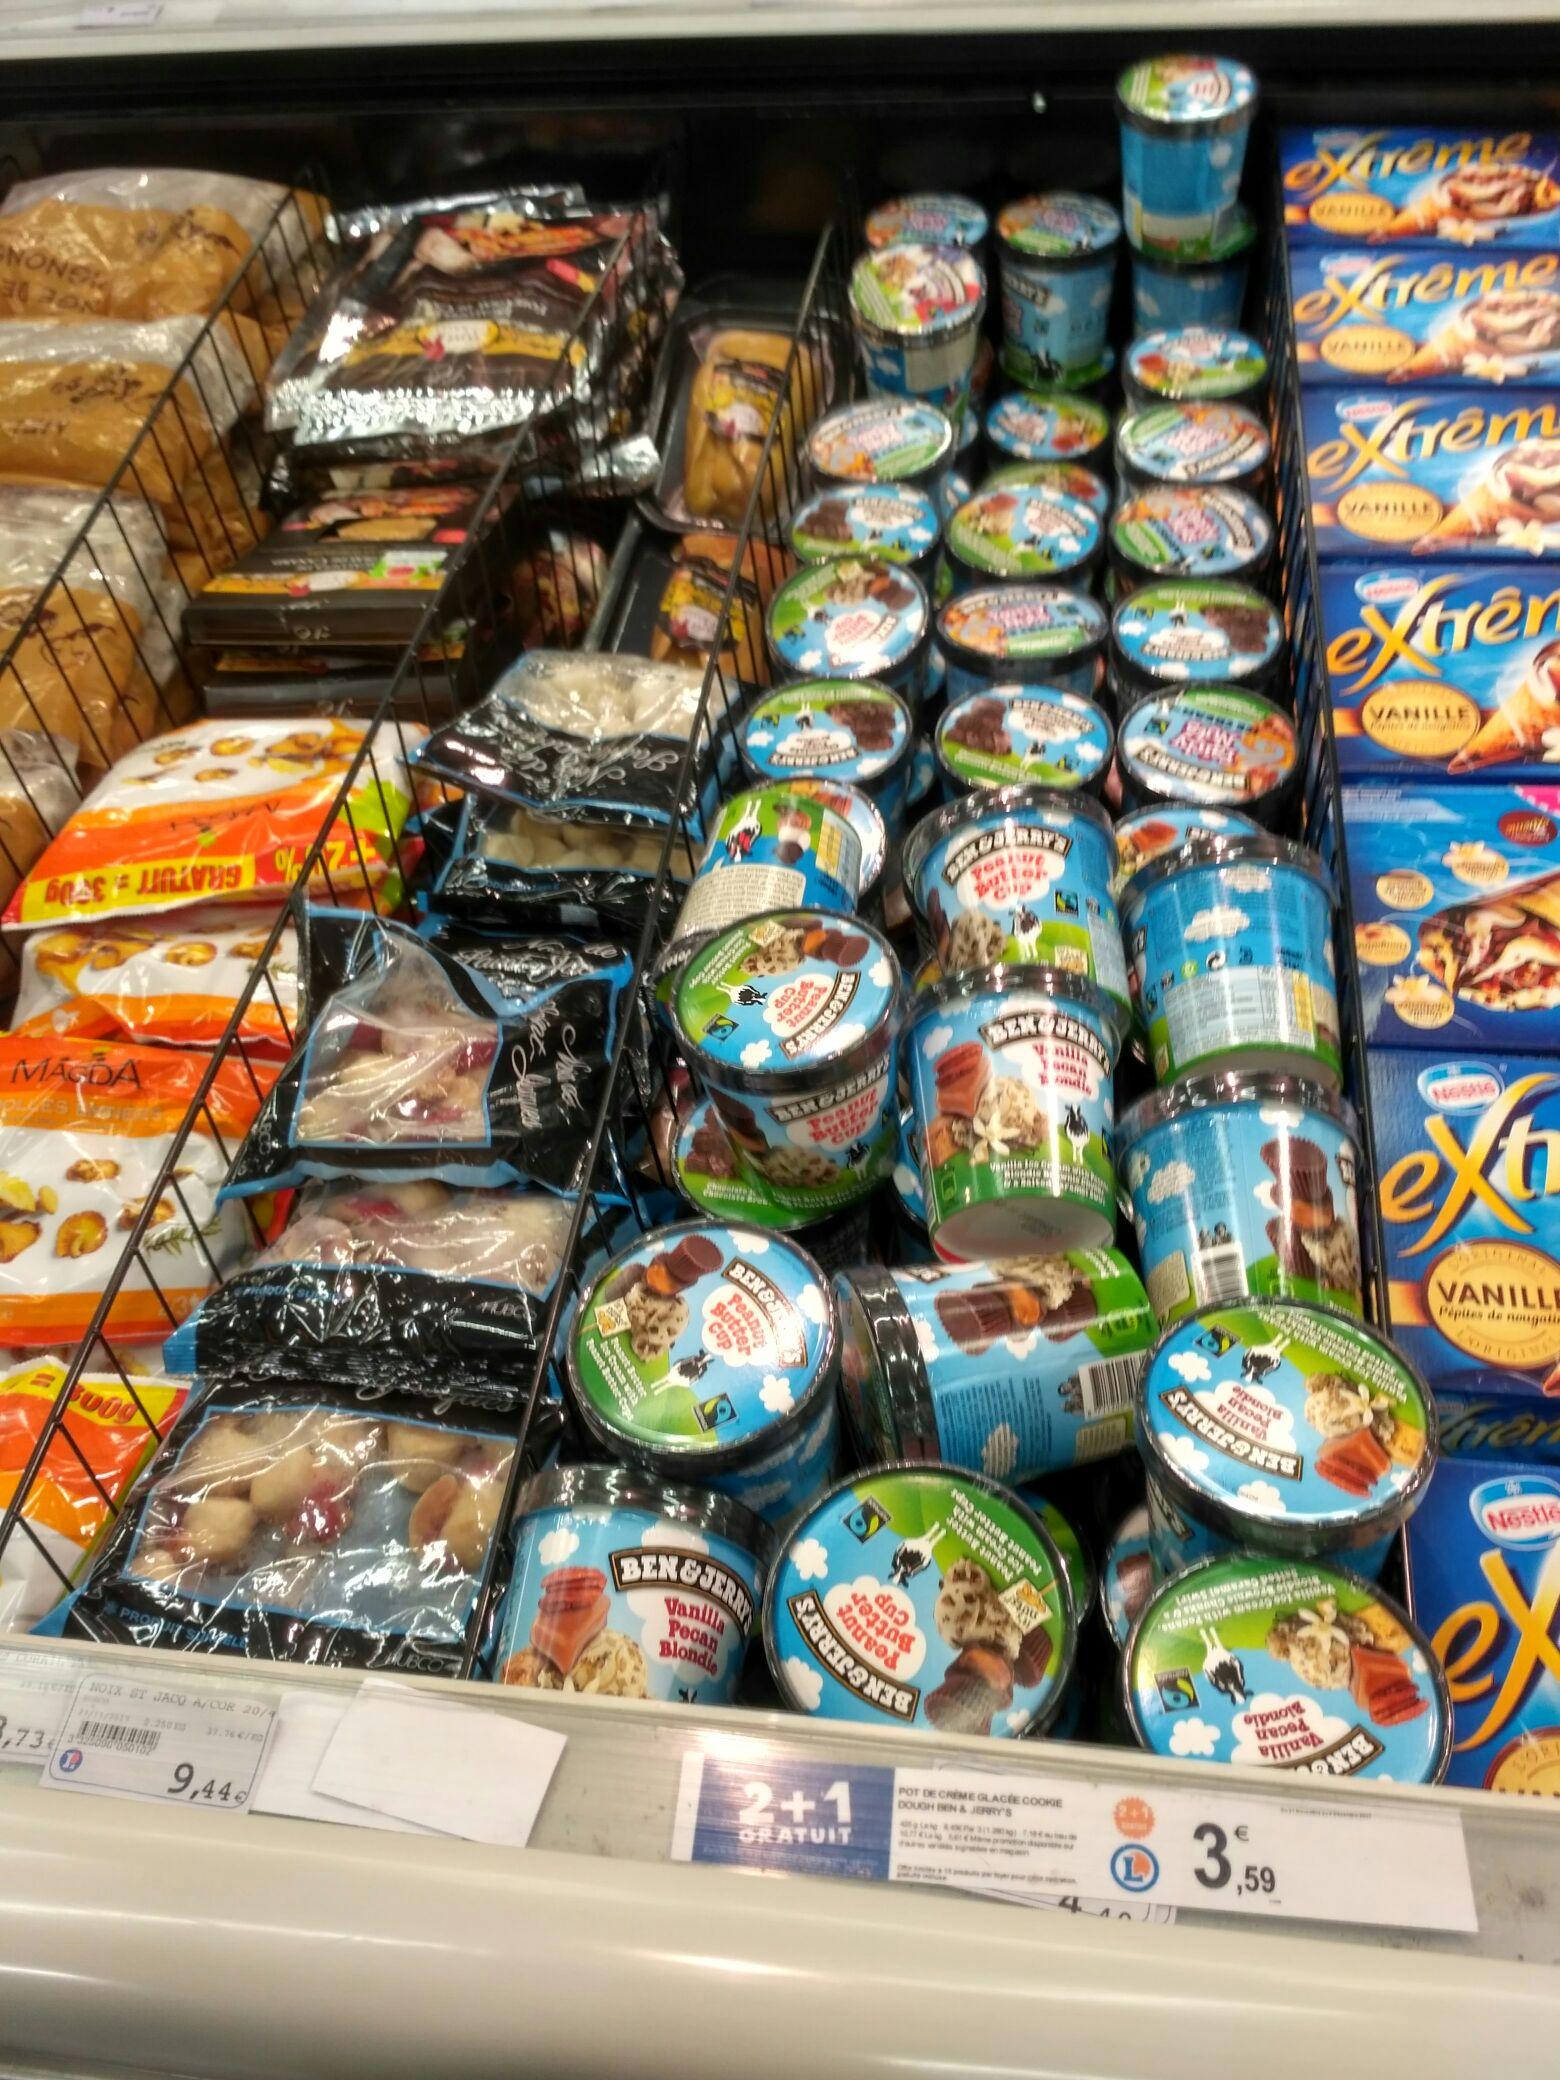 [Lokal] Frankreich/Straßburg/Rivetoile/Leclerc. Top Angebot Ben & Jerry's Eis